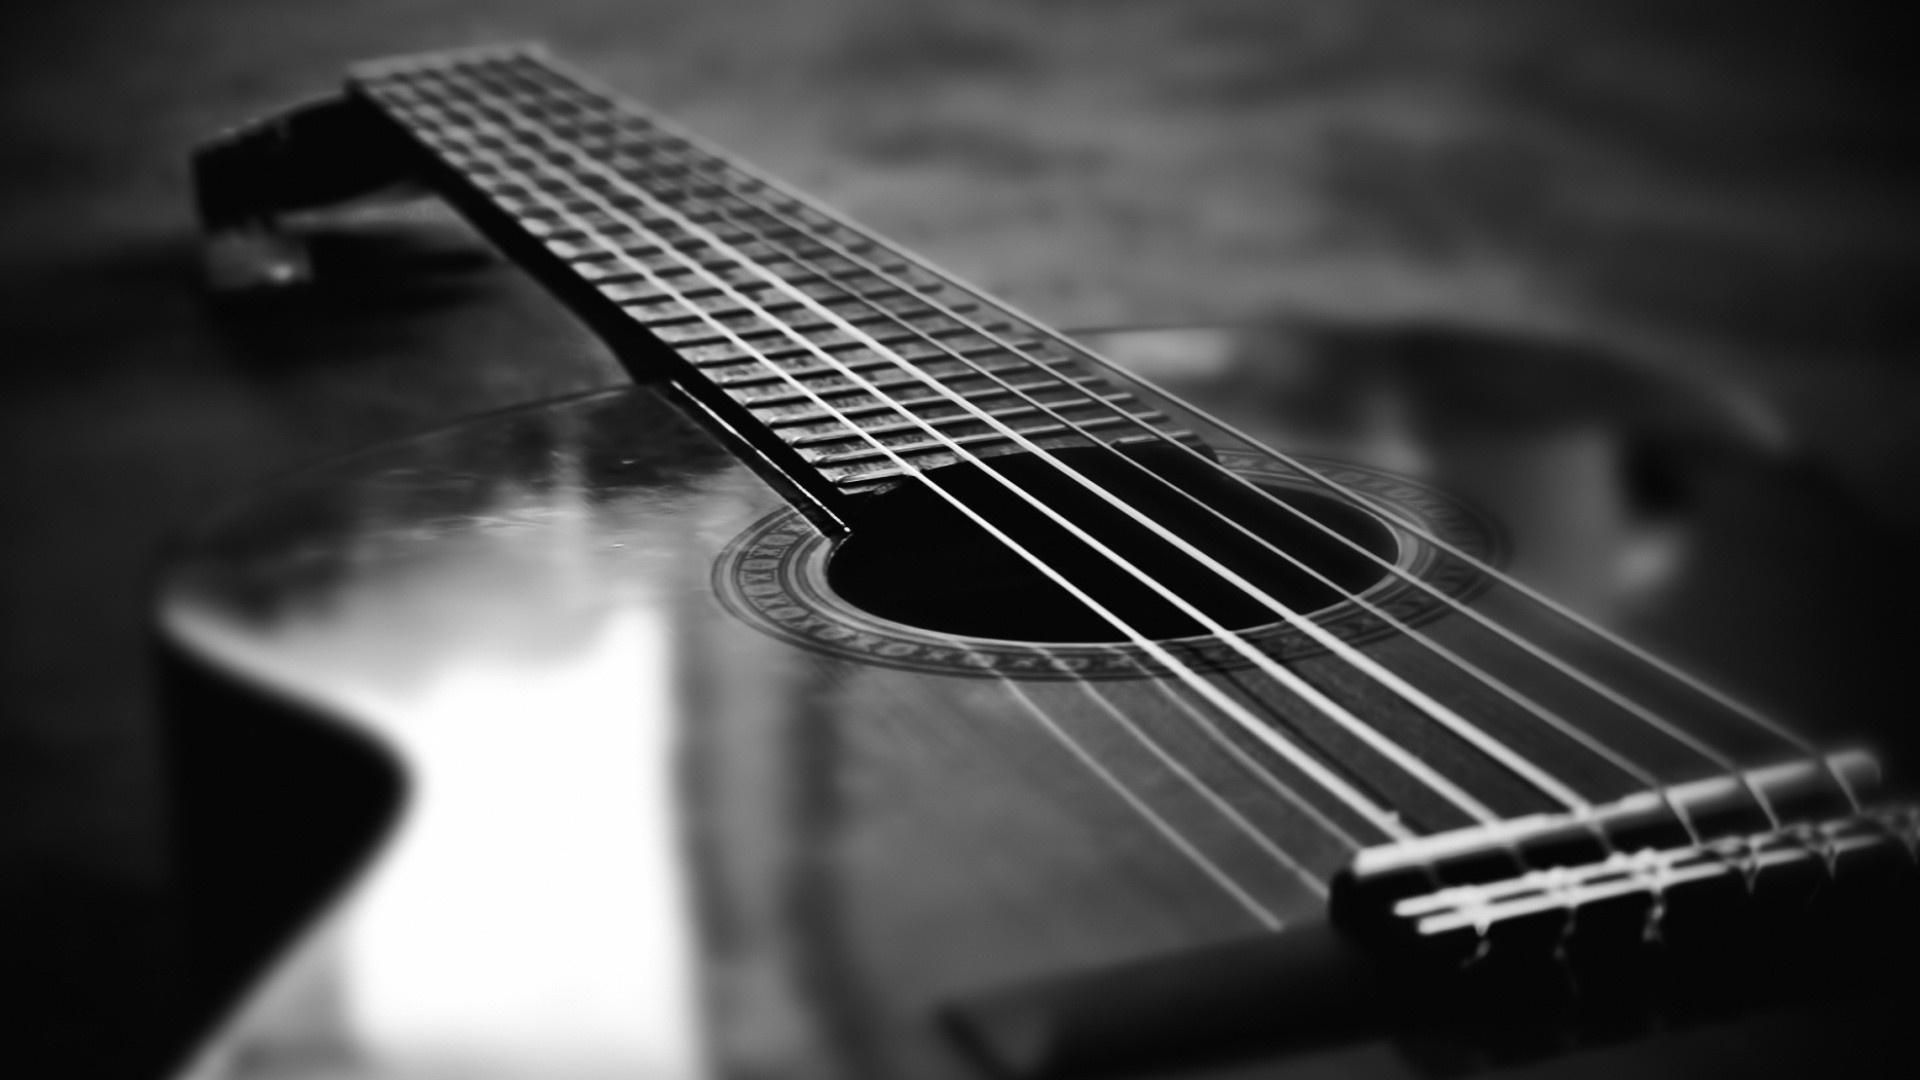 Acoustic Guitar, Best Wallpaper